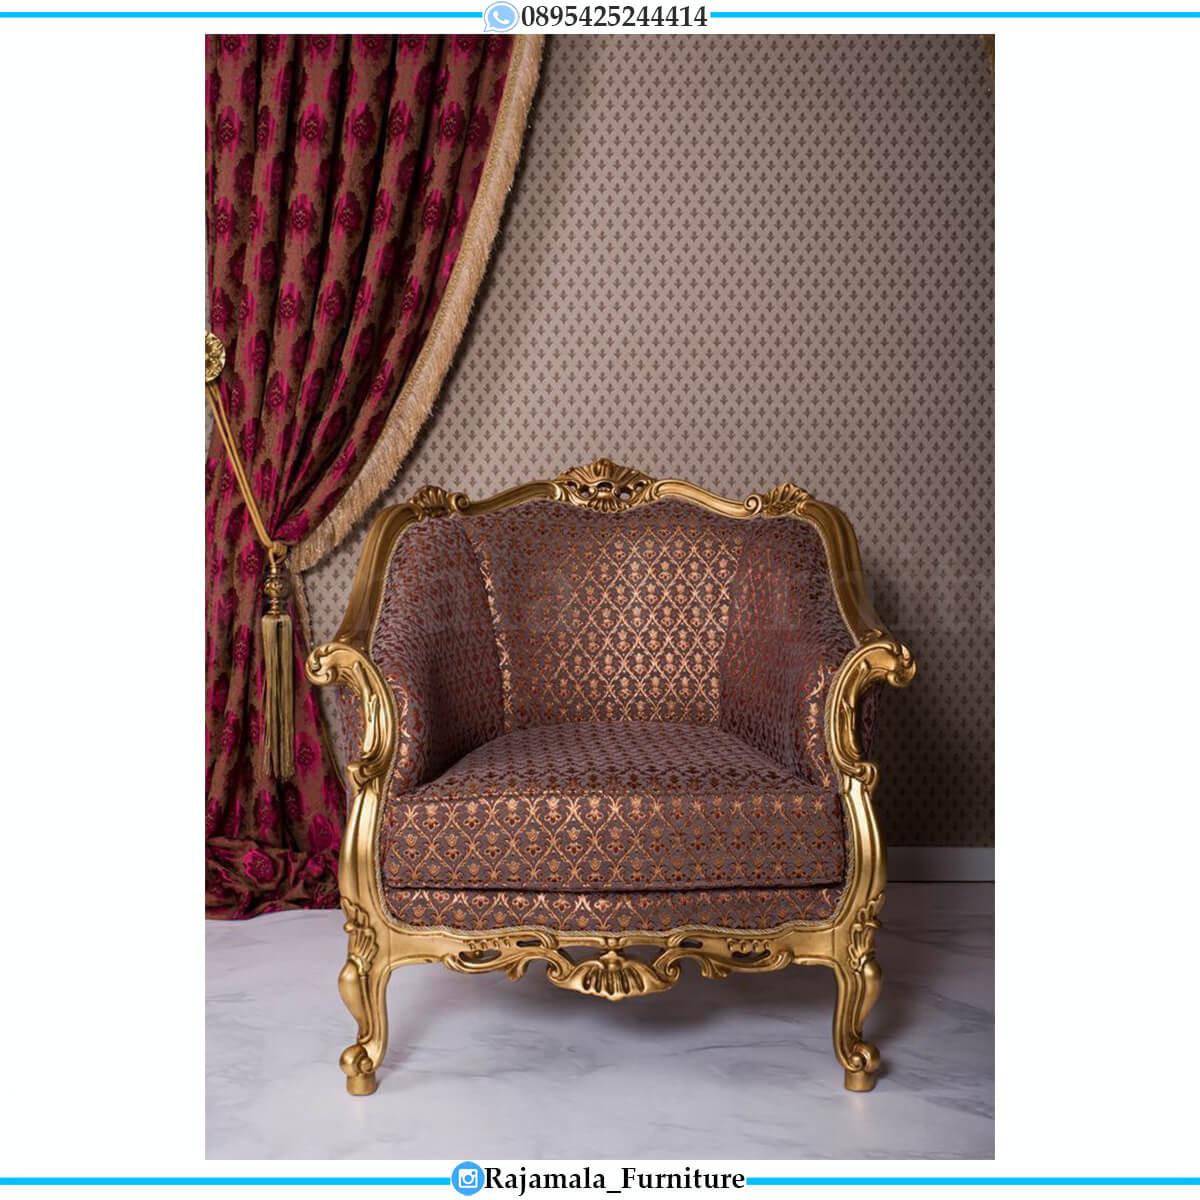 Sofa Tamu Mewah Berkualitas Soft Red Fabric Luxury Design RM-0732